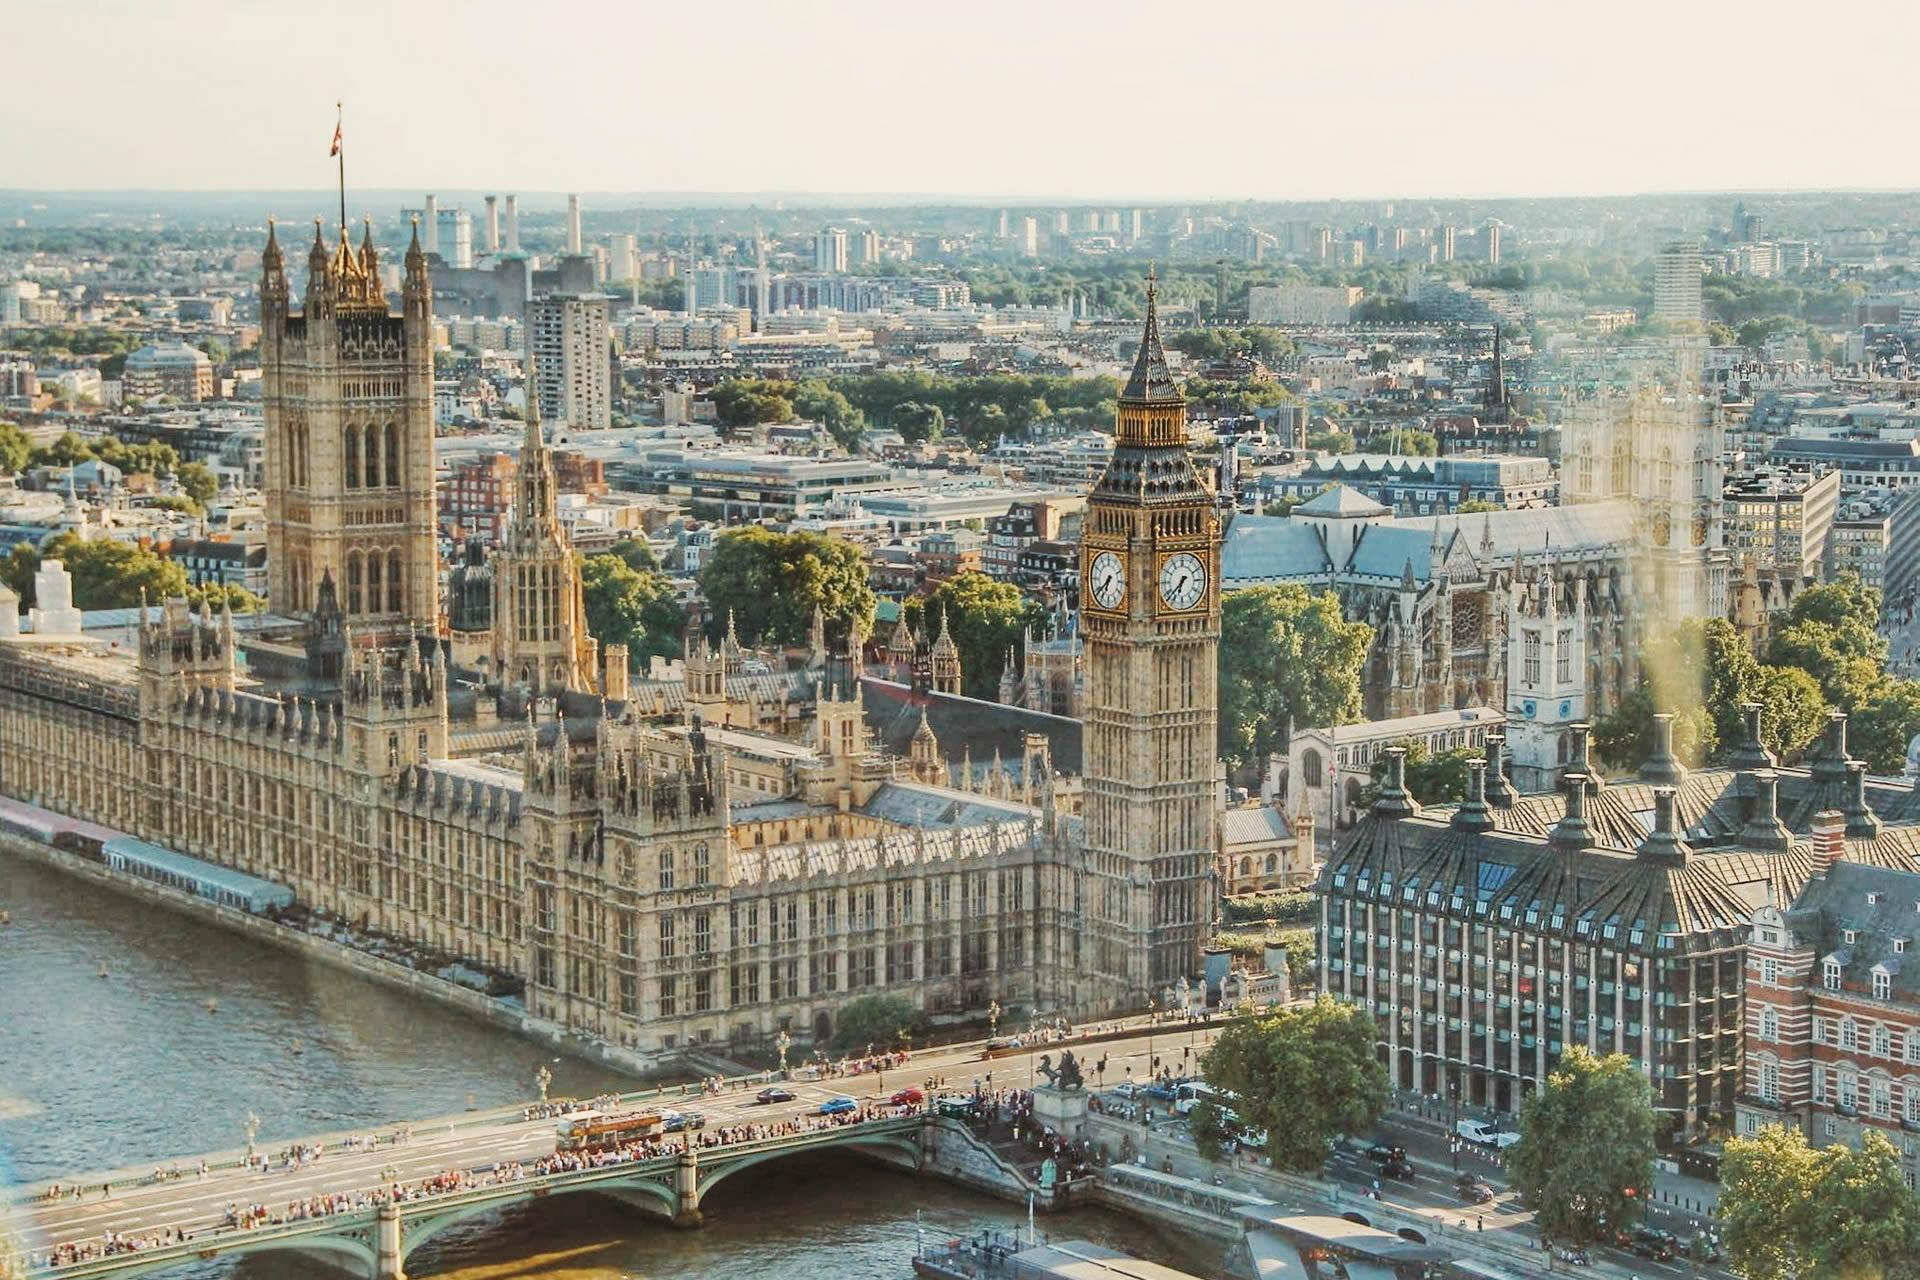 Westminster Houses of Parliament by Dominika Gregušová